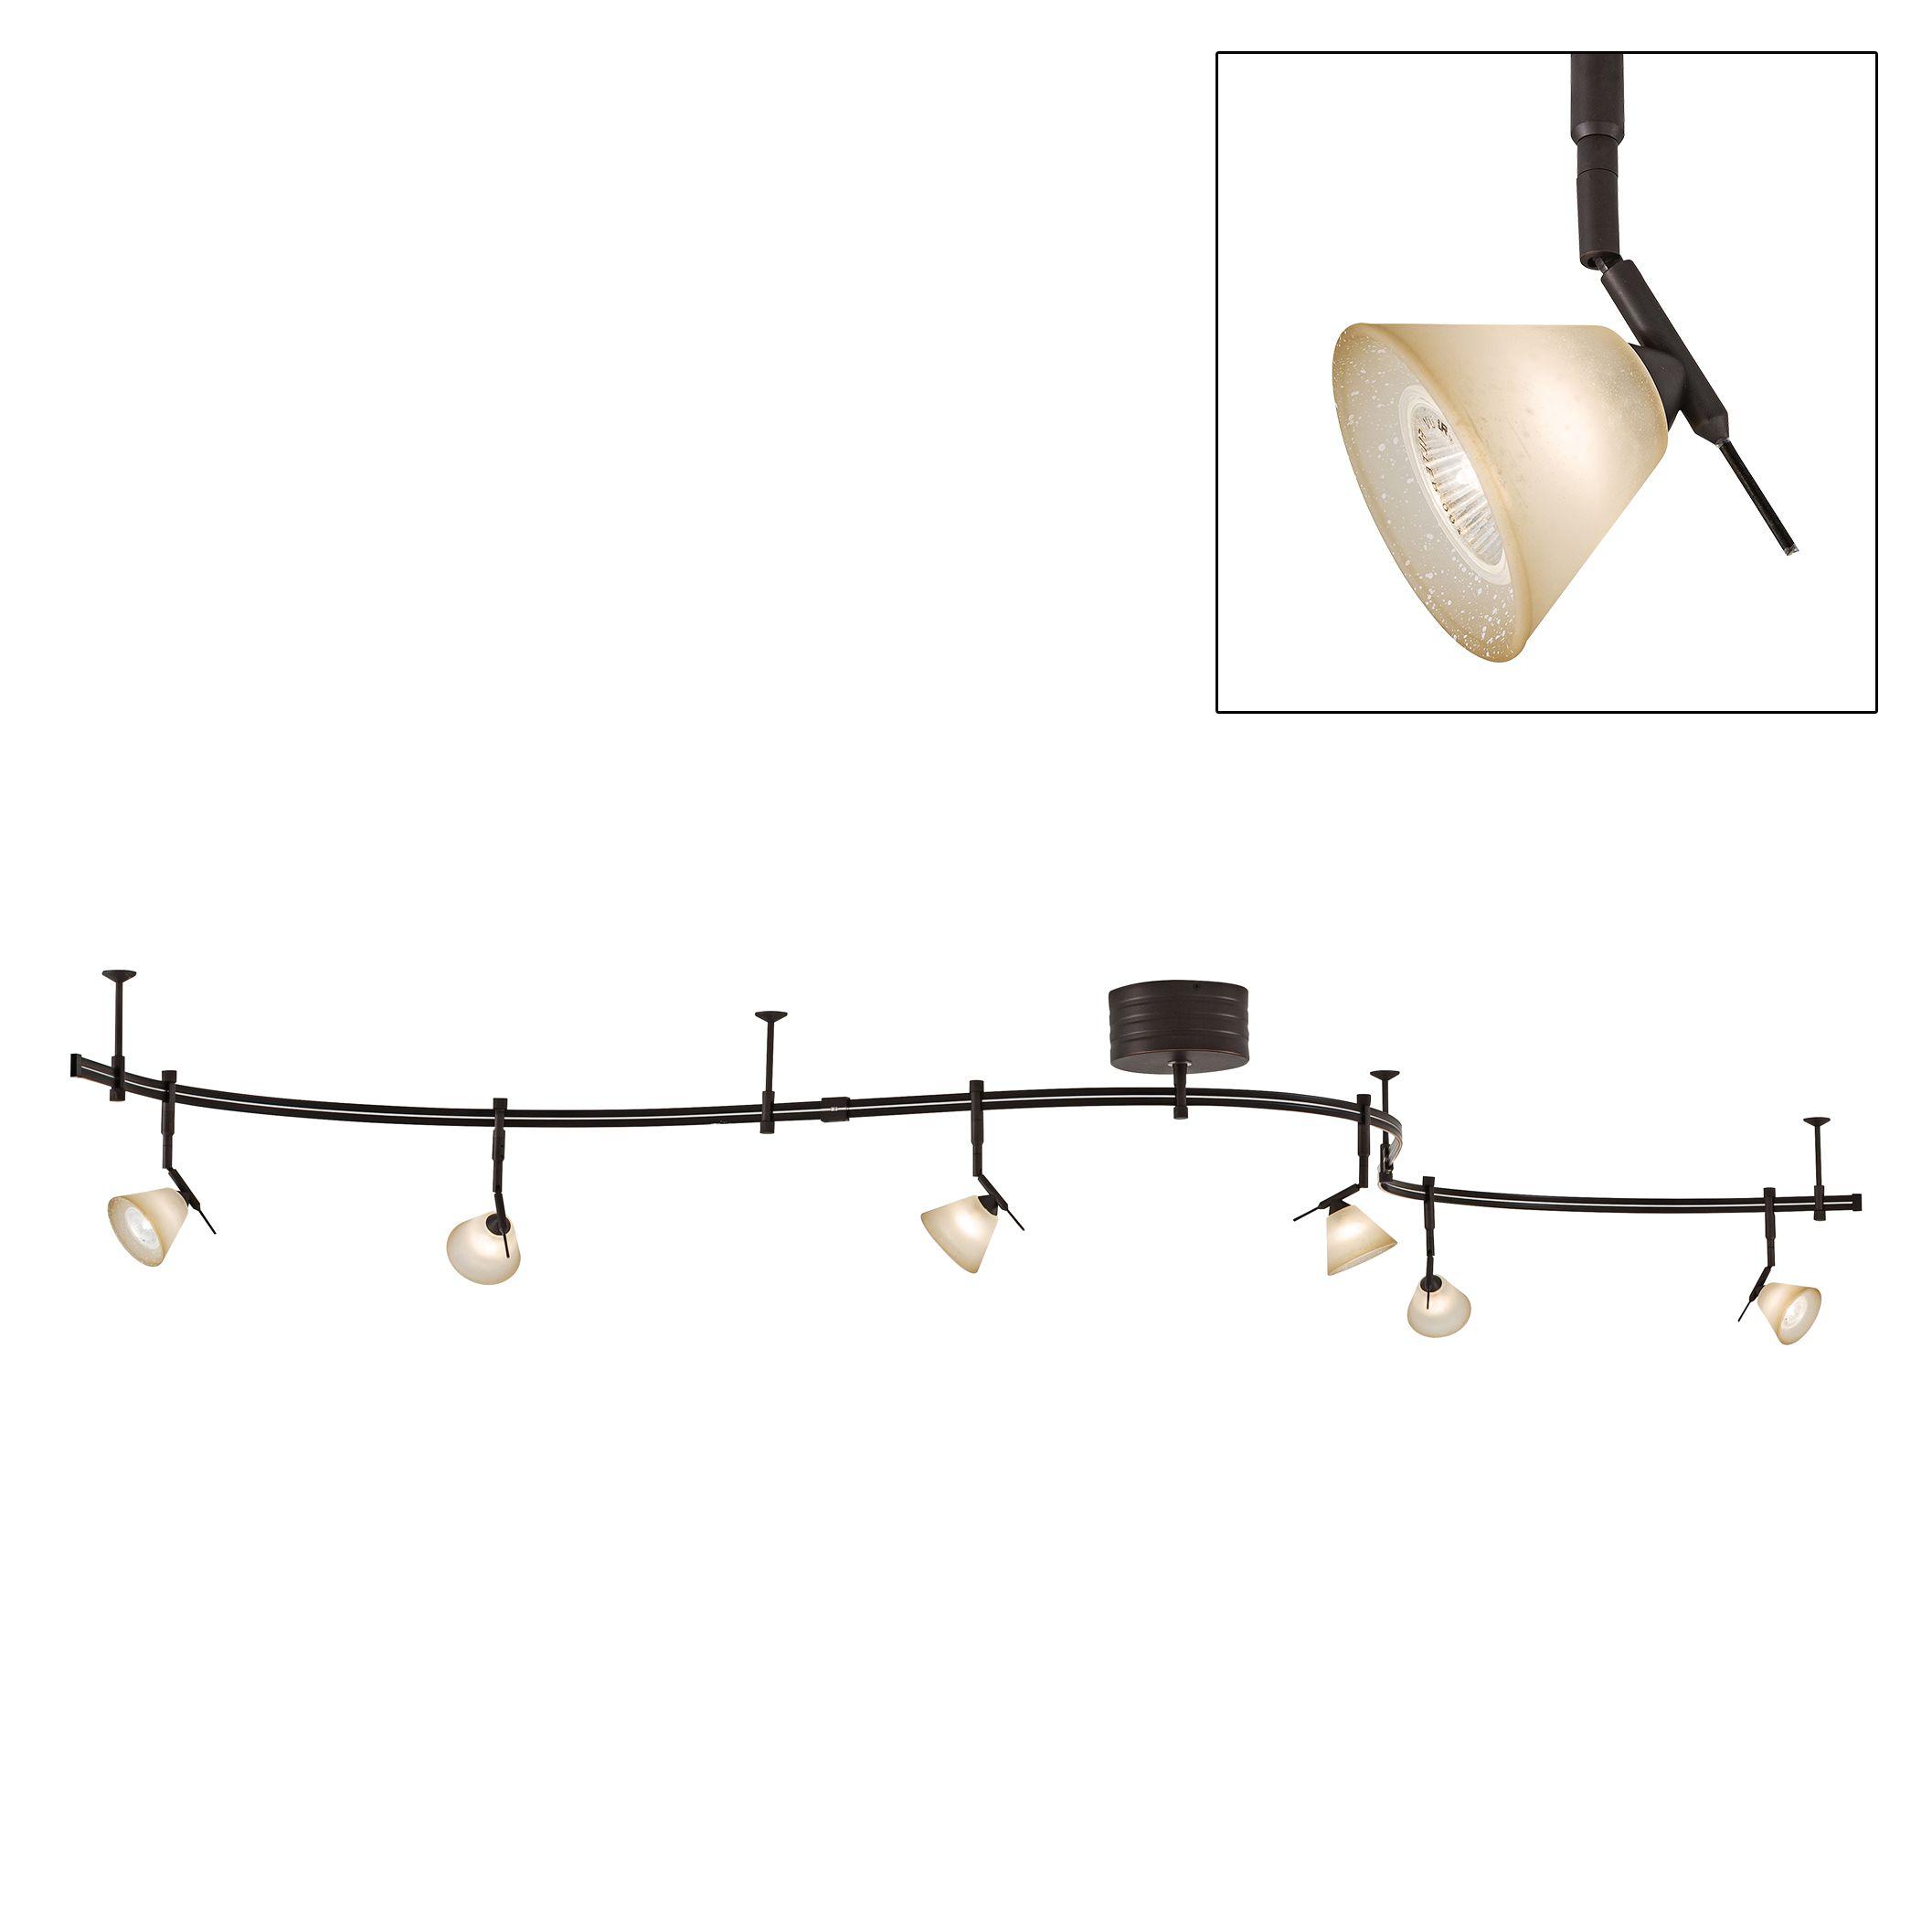 George Kovacs Bronze 6-Light Expandable Rail Track Light Kit  sc 1 st  L&s Plus & Monorail Lighting - Flexible Track Kits and Components | Lamps Plus